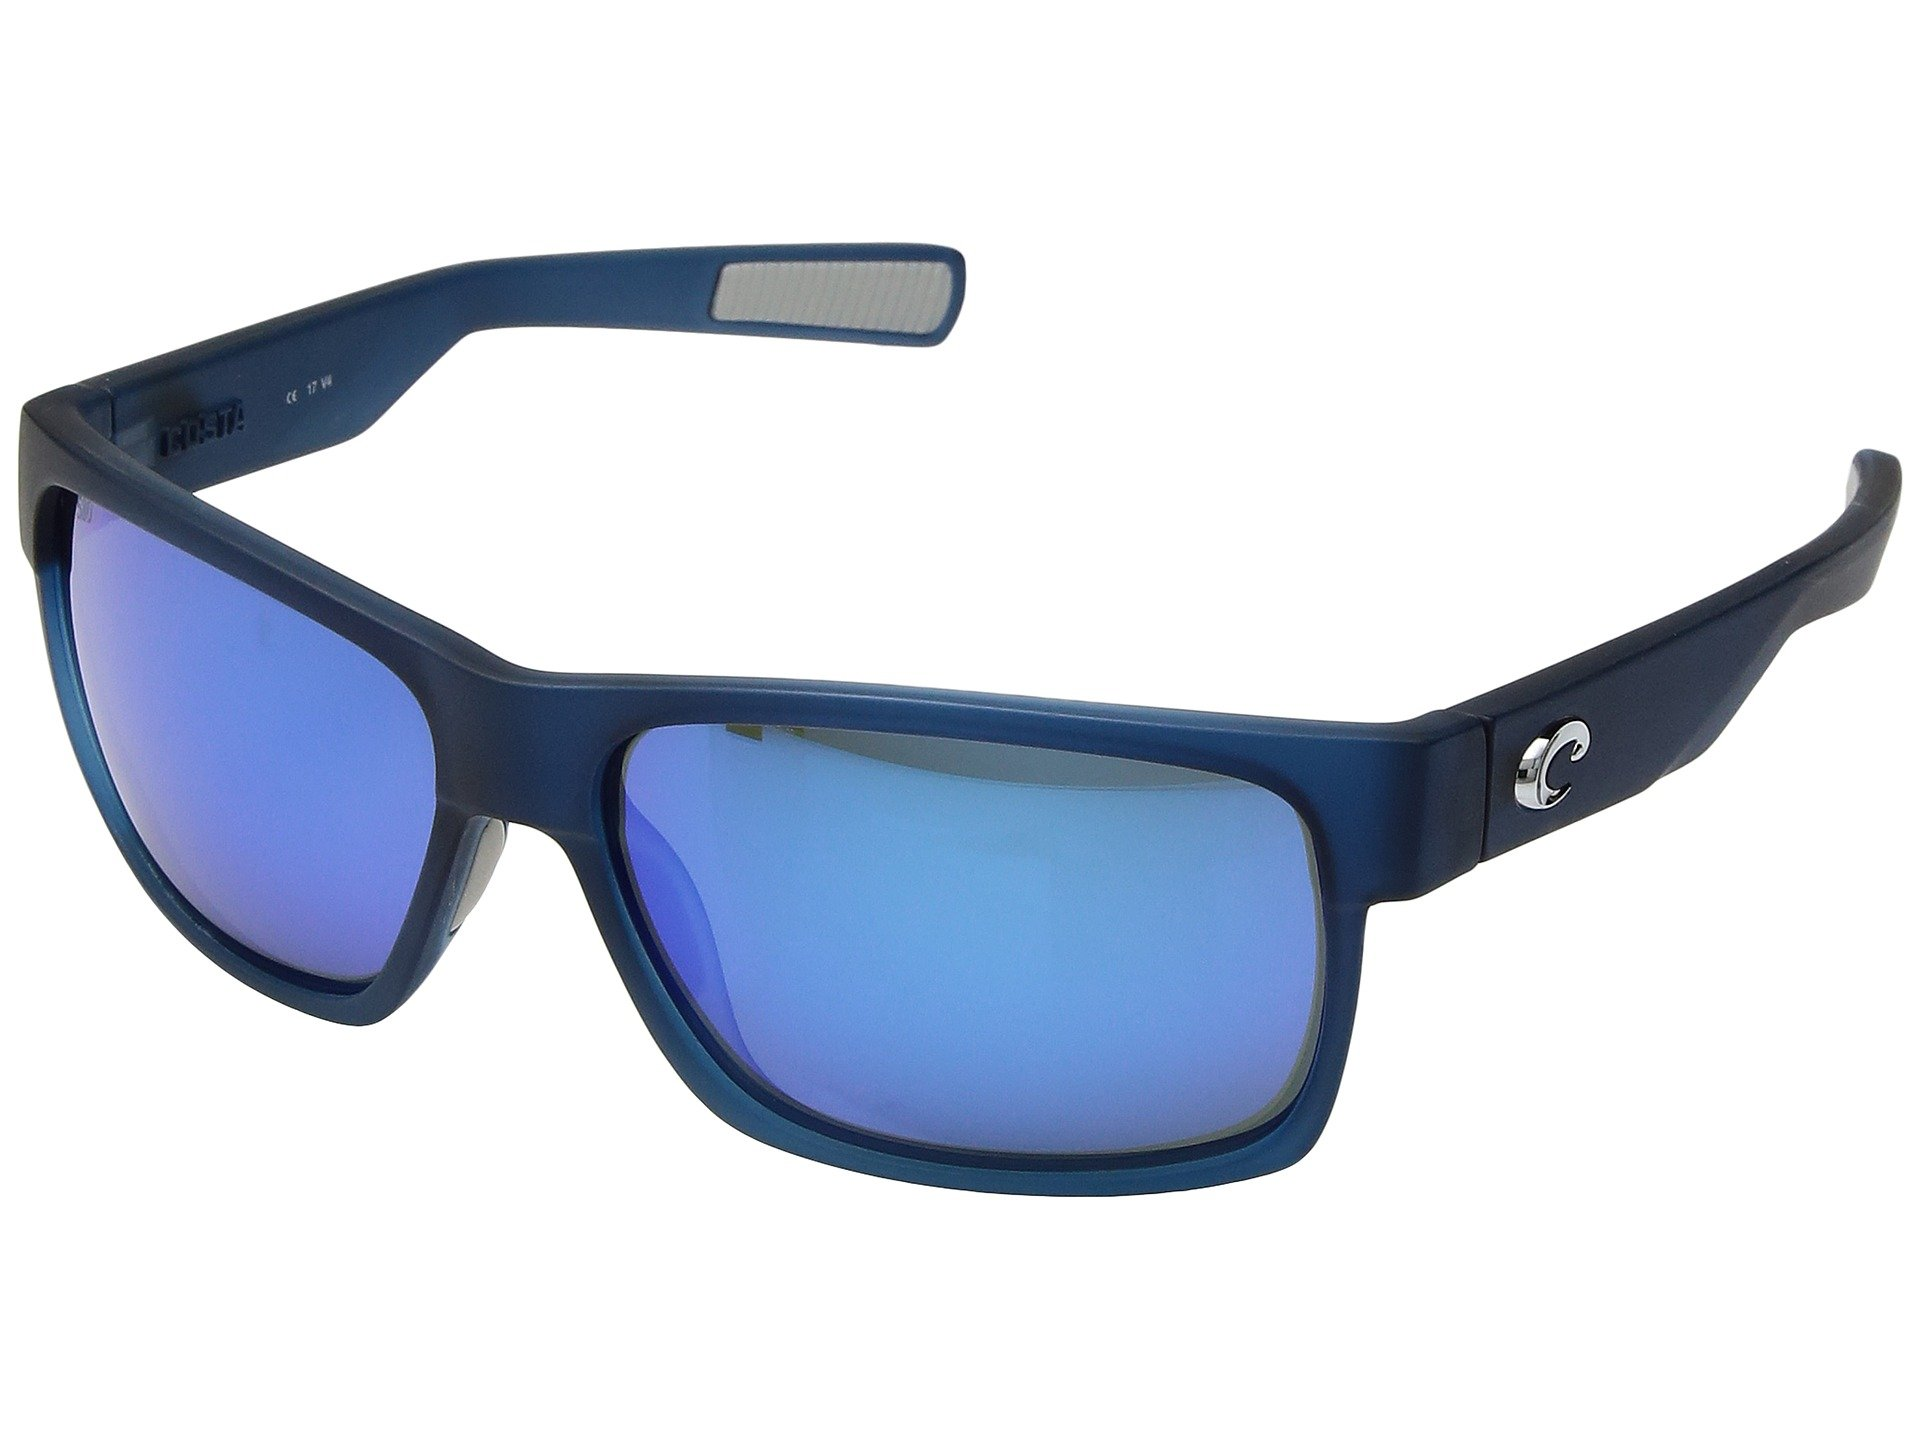 Costa Unisex Half Moon Bahama Blue Fade/Blue Mirror 580g One Size